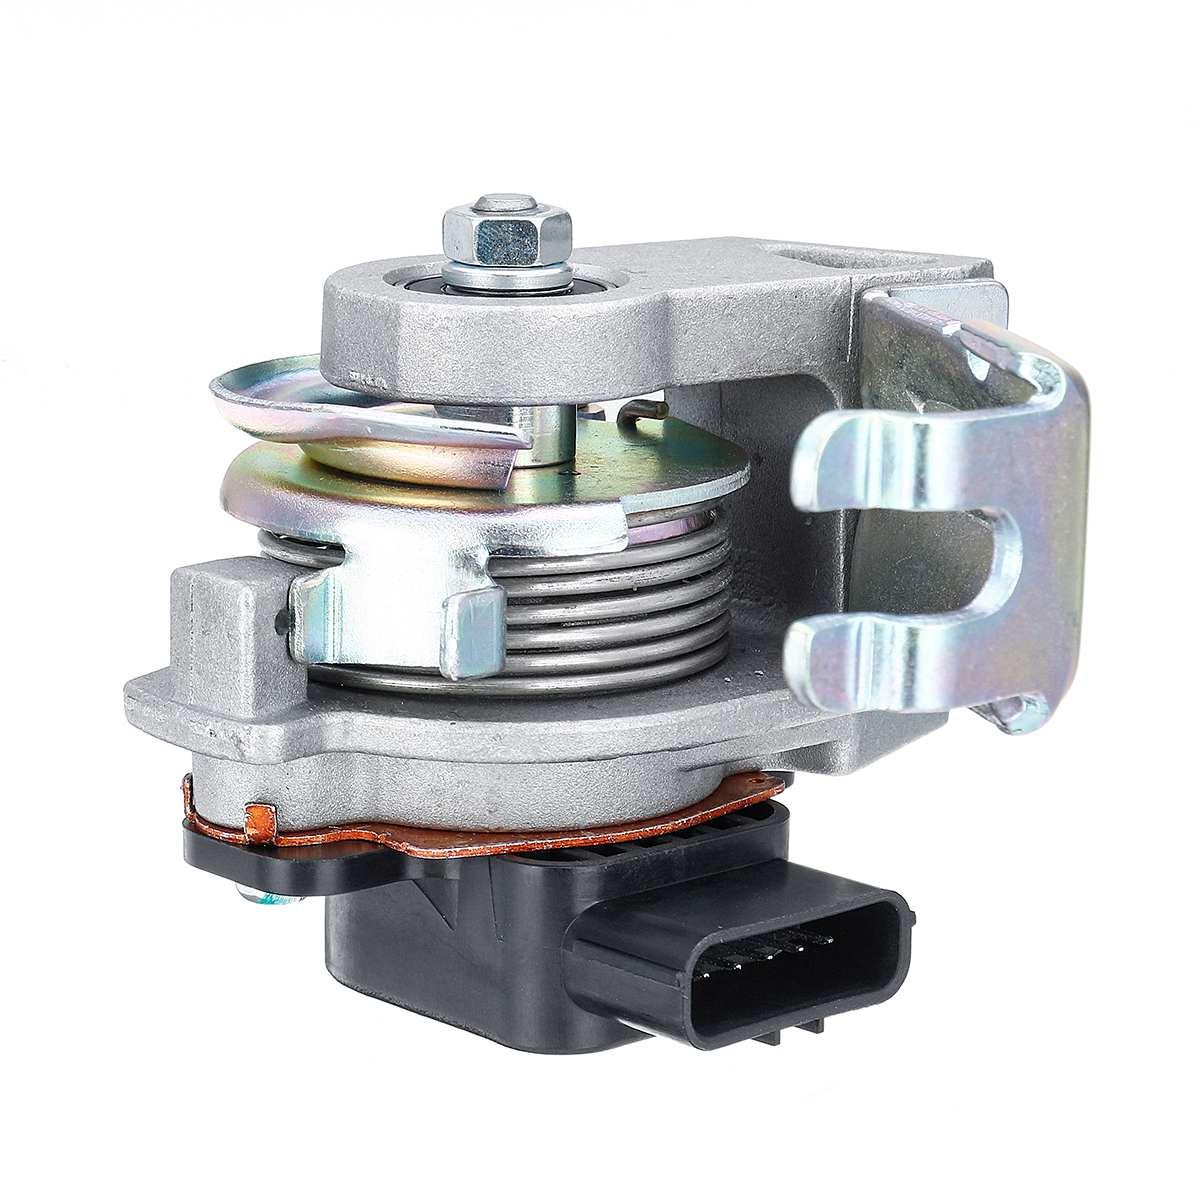 37971 RBB 003 37971RCA A01 Accelerator Pedal Sensor For Honda Acura TL TSX 2004 2008 2